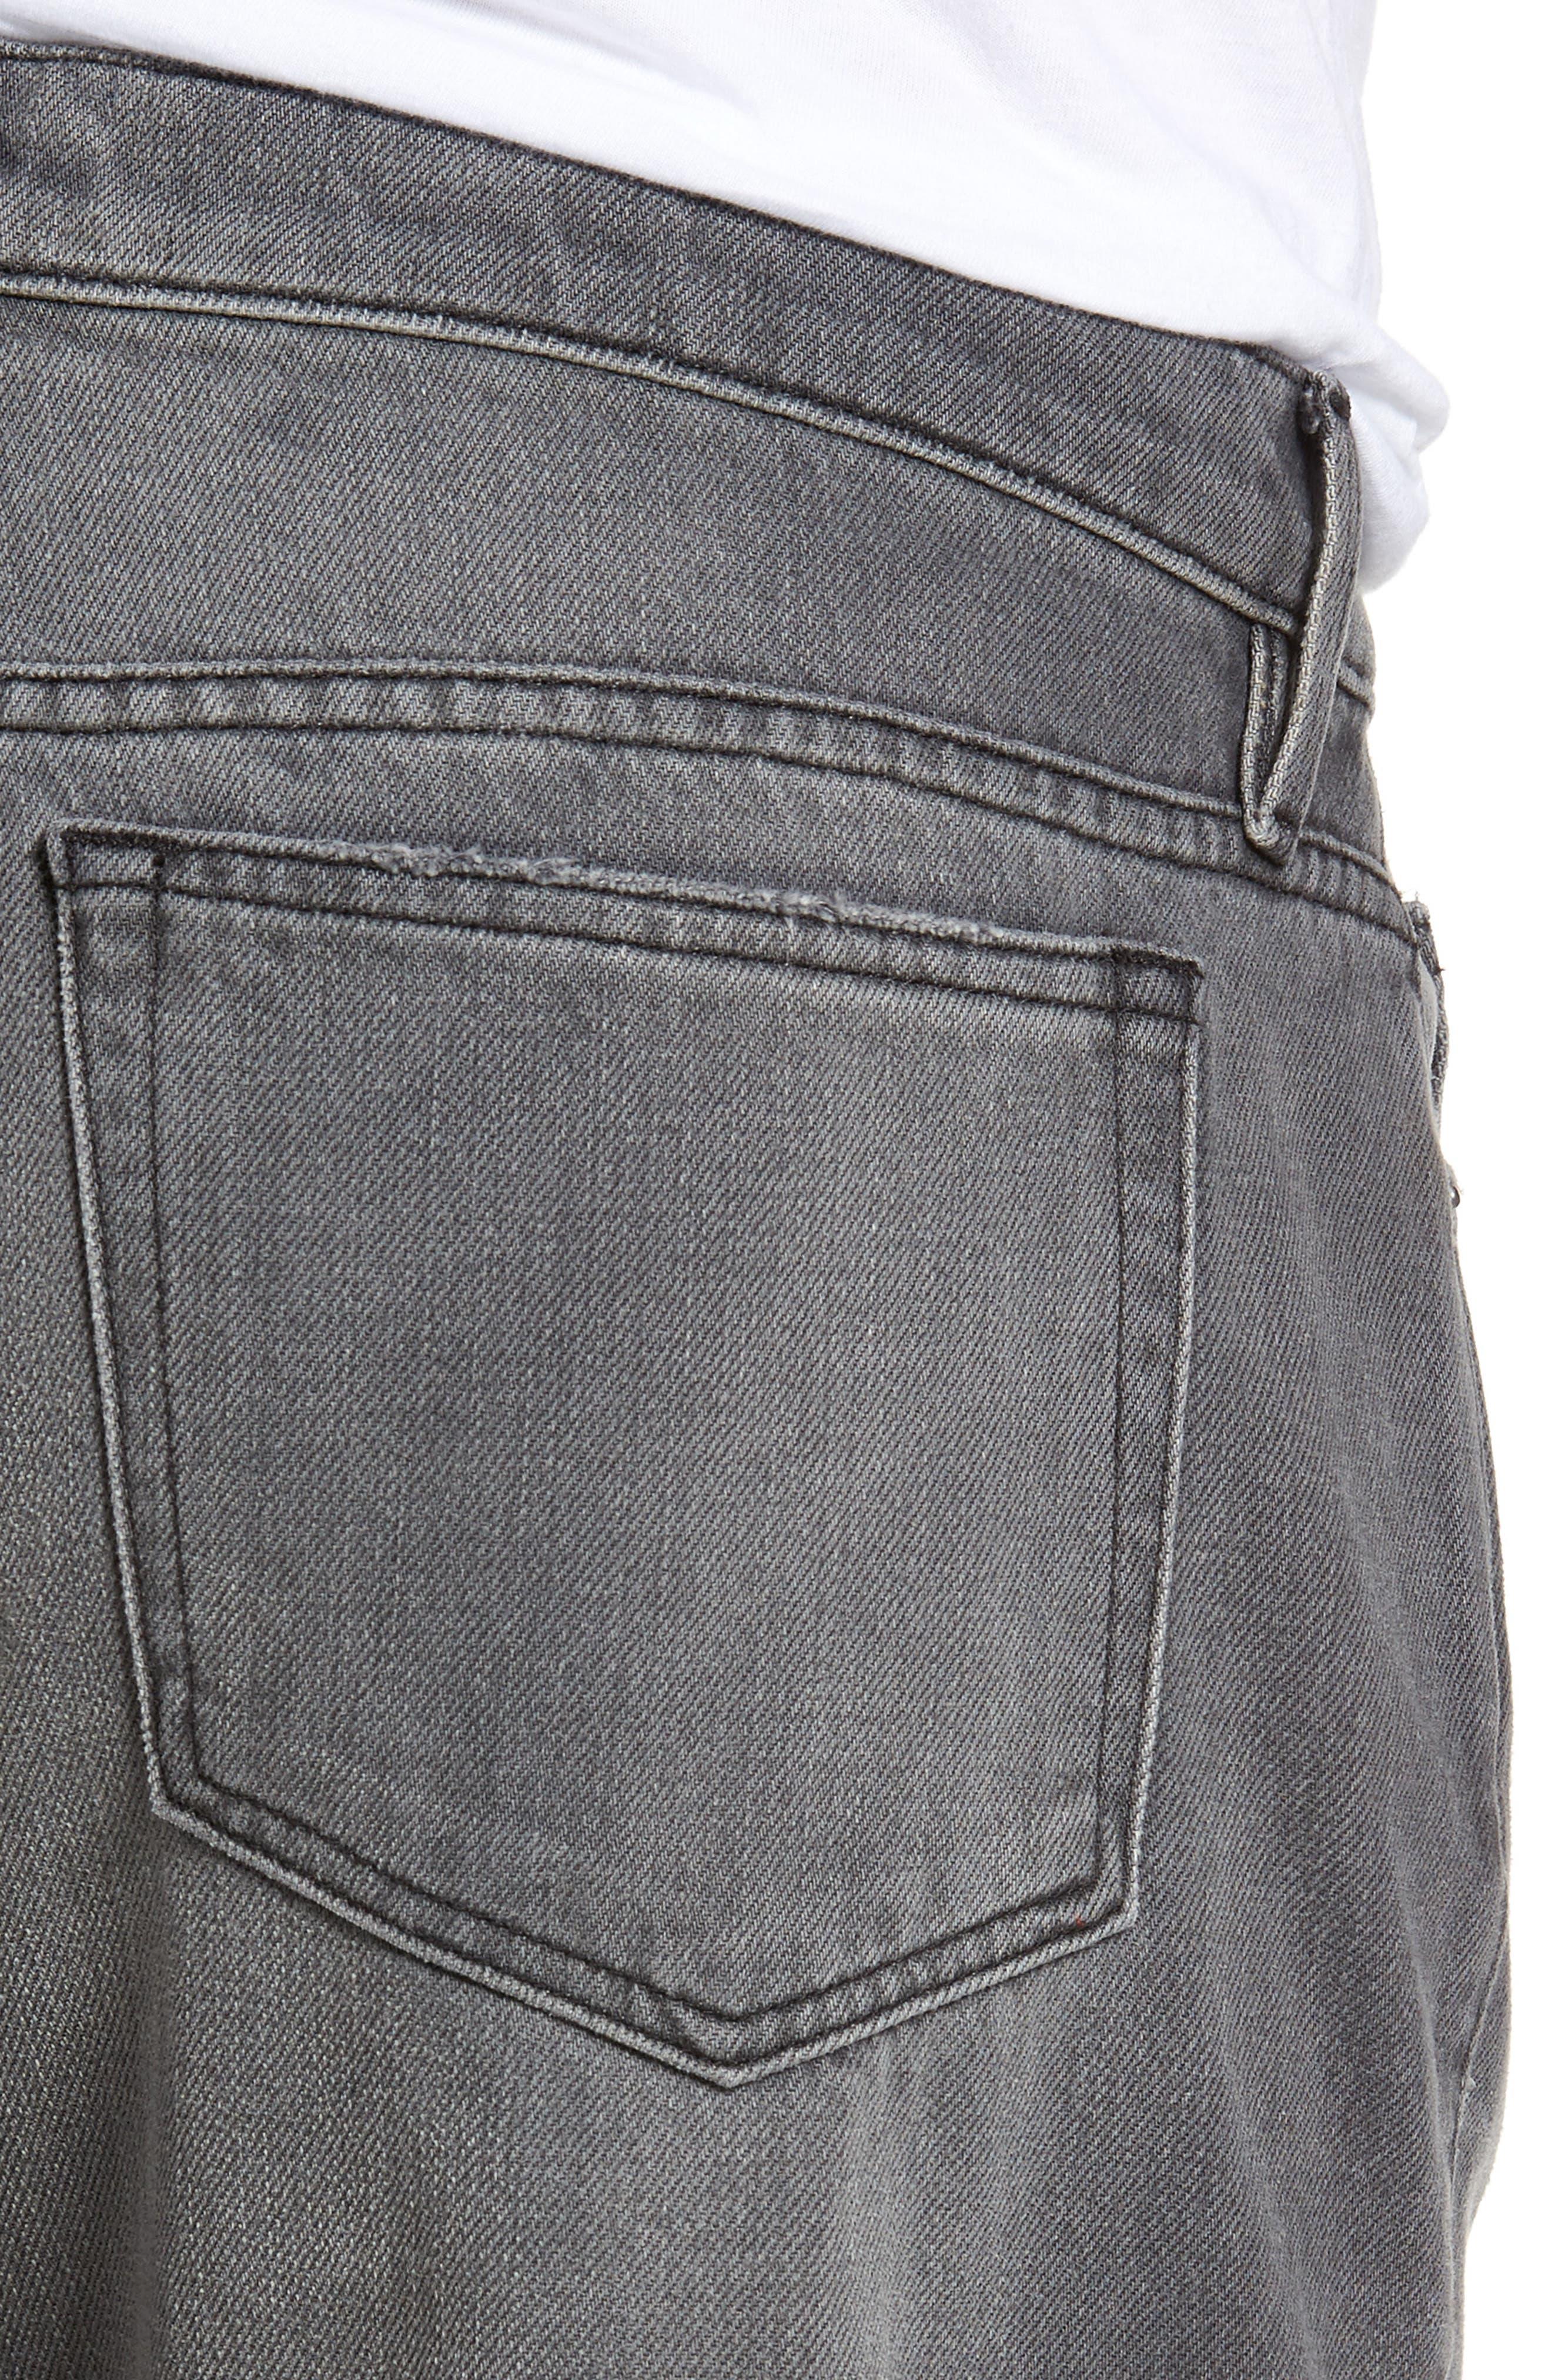 L'Homme Slim Straight Leg Jeans,                             Alternate thumbnail 4, color,                             050